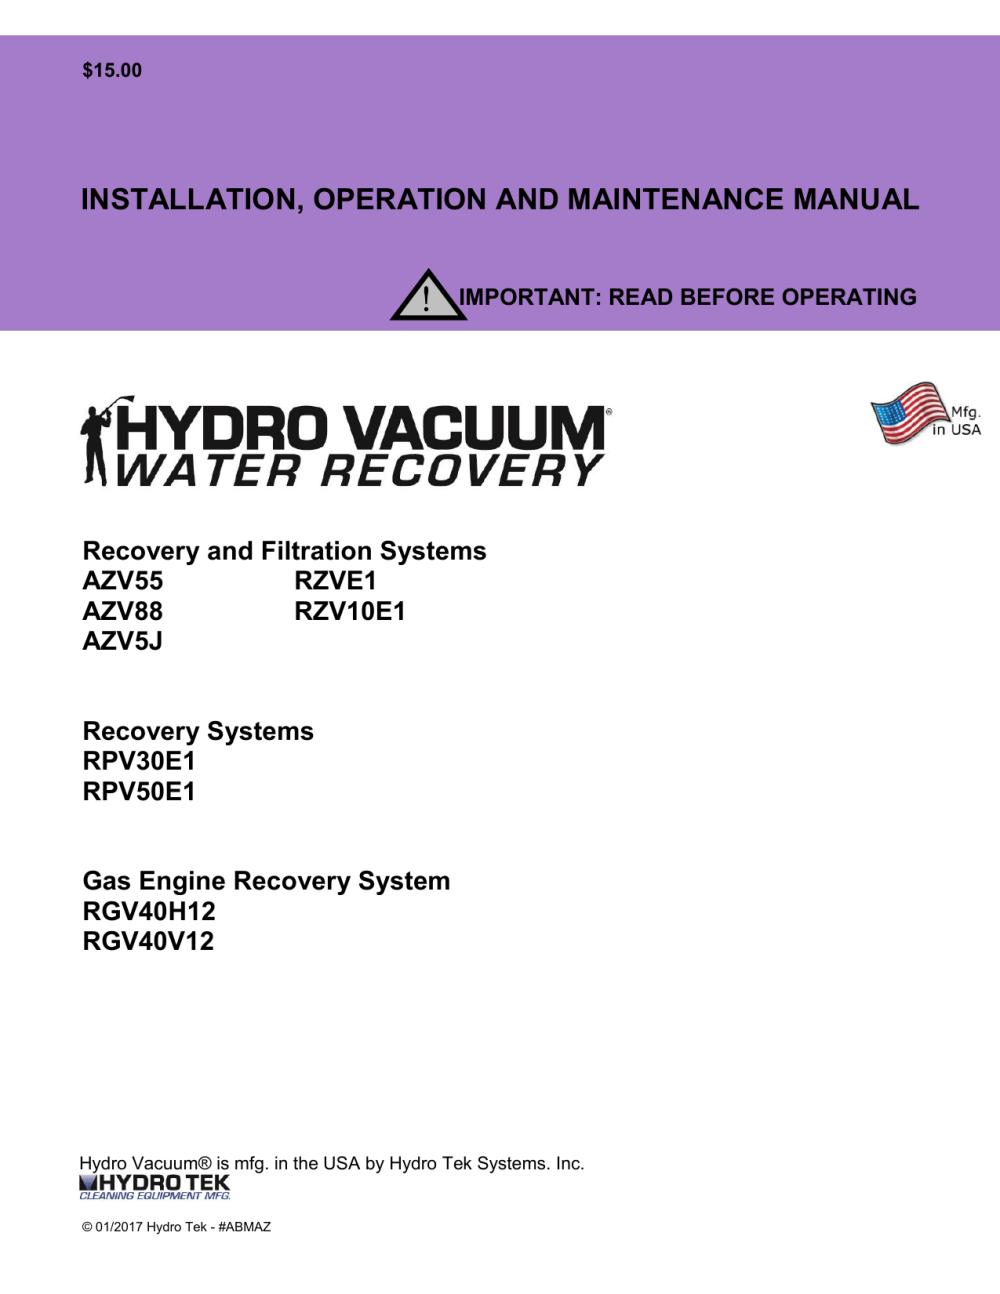 medium resolution of 2017 hydro vac operations manual